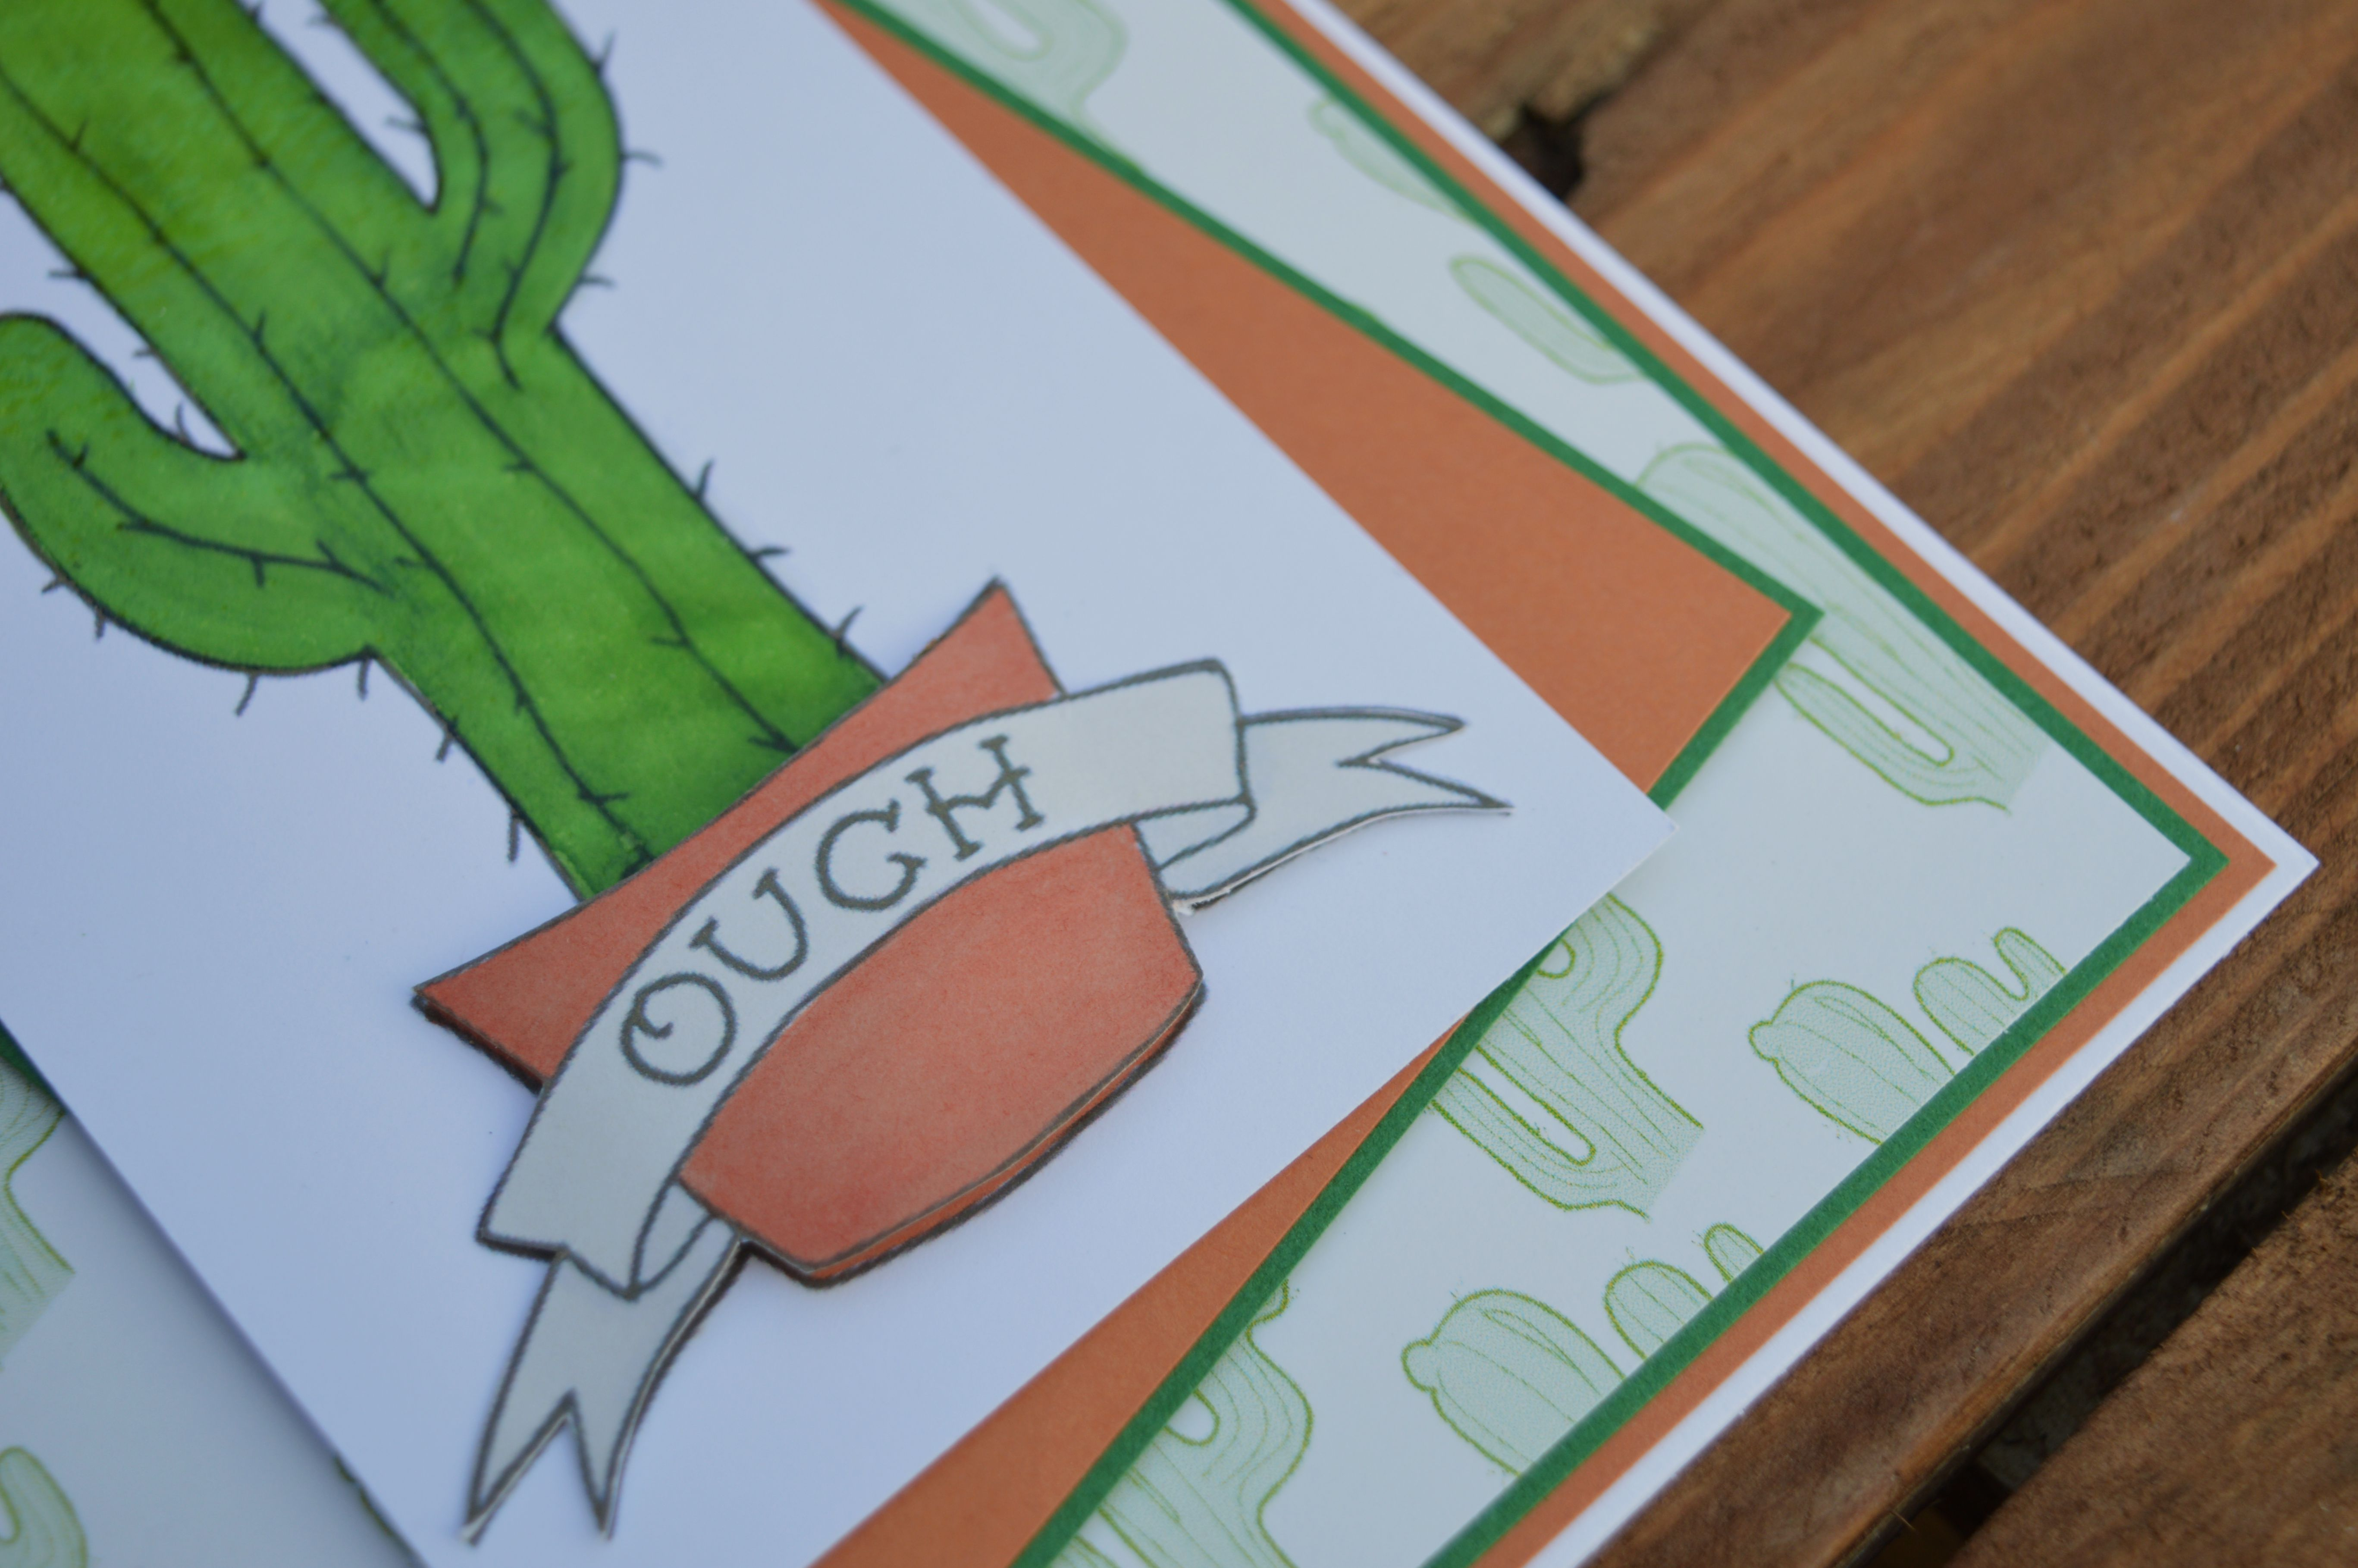 birthday card illustration unique greetings cacti gift papercraft handmade alternative tattoo cactus